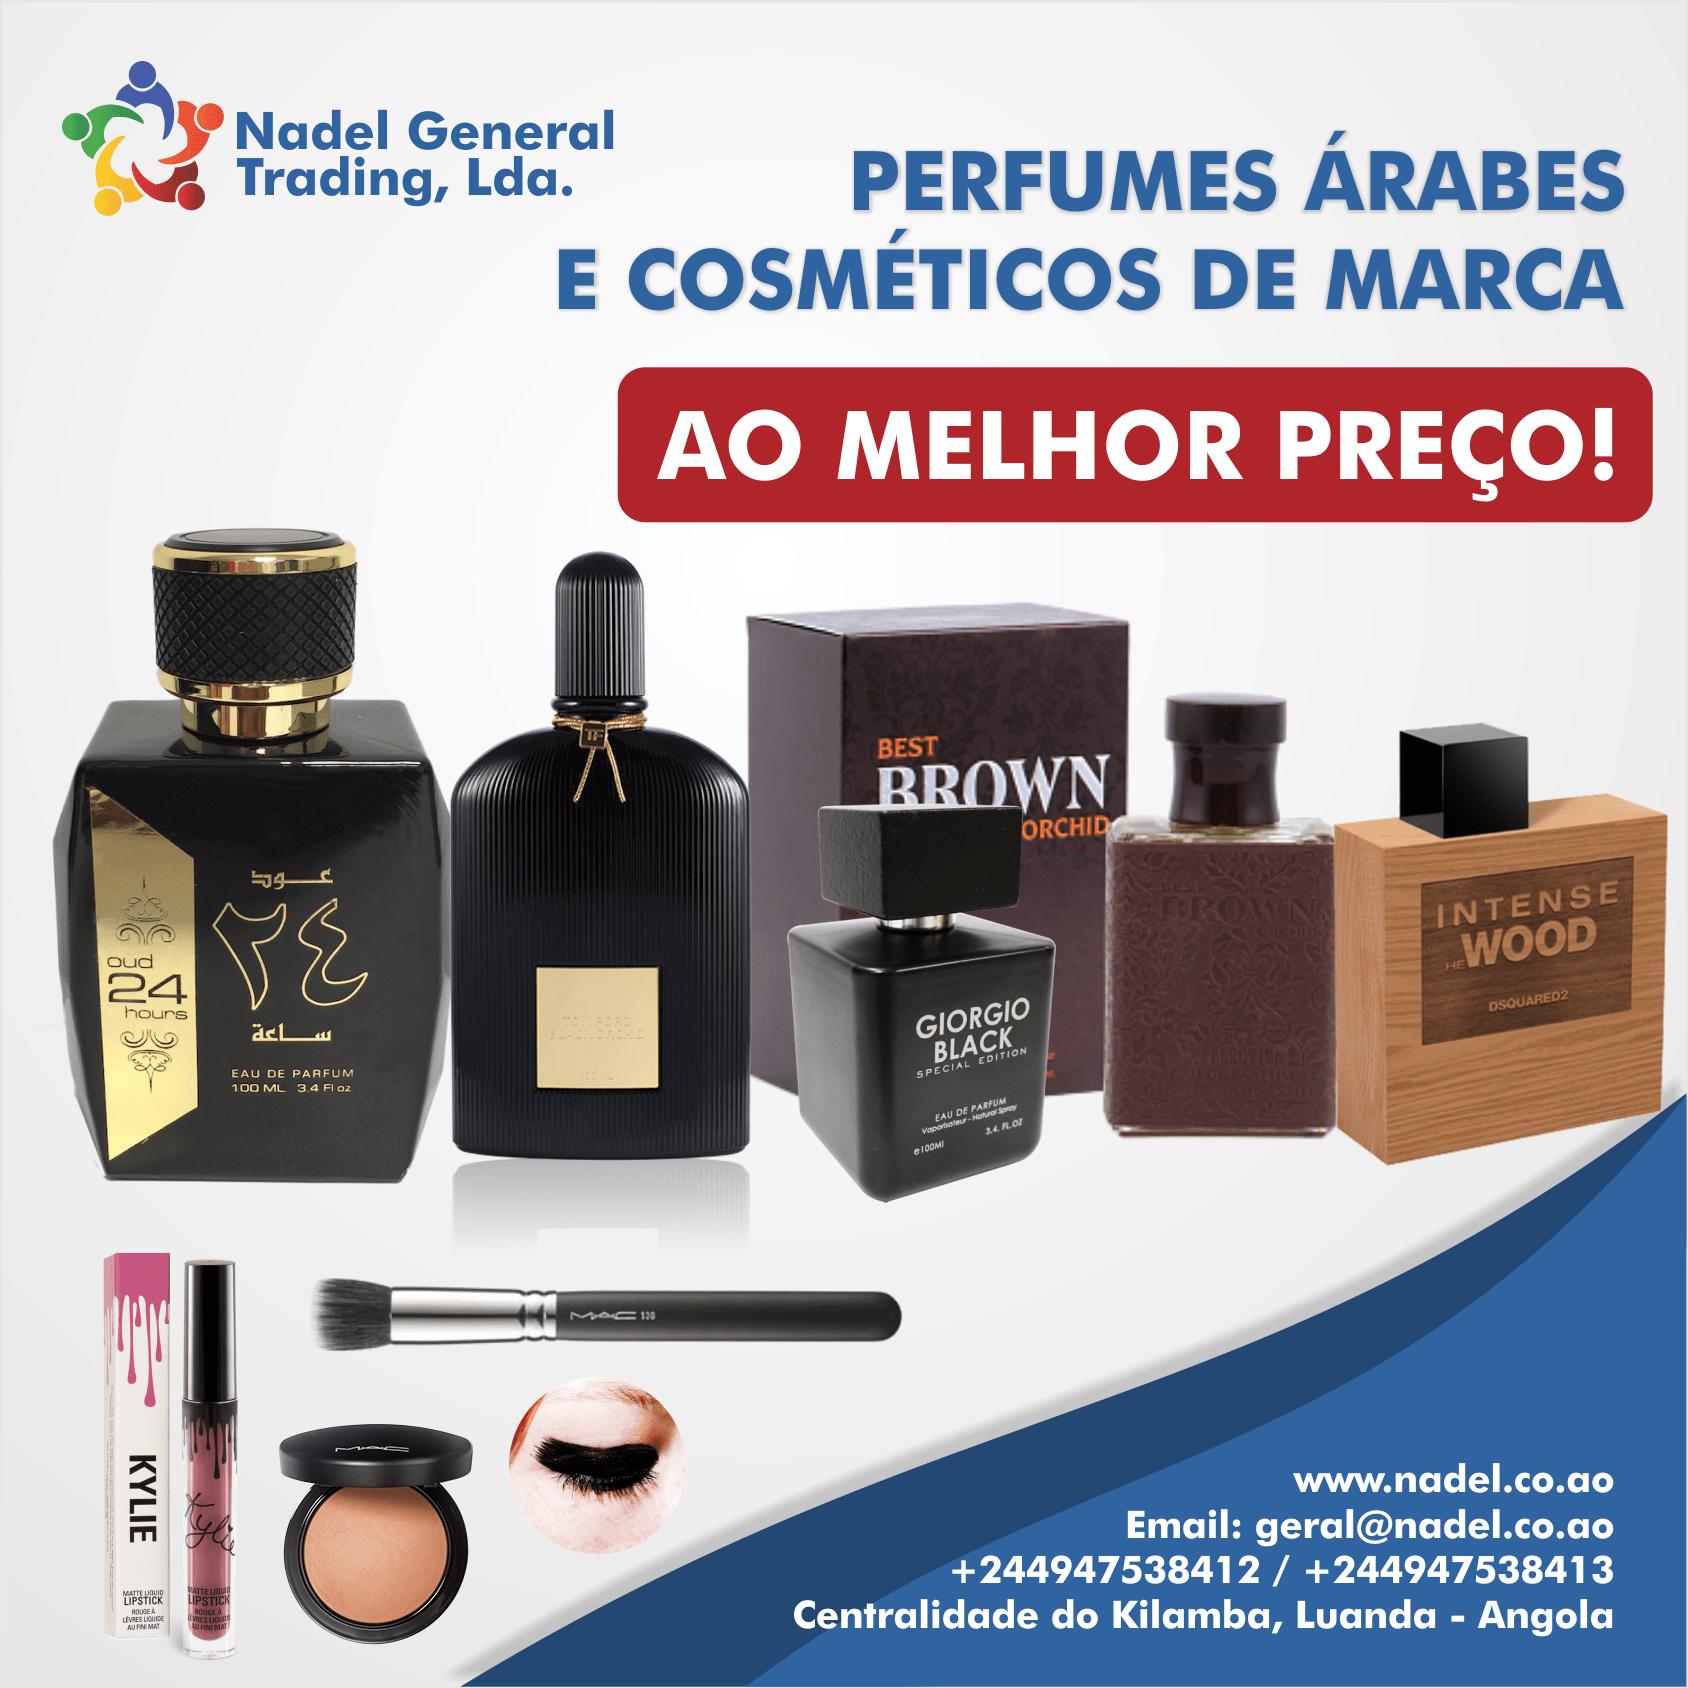 Nadel General Trading (Promoção da Perfumaria)